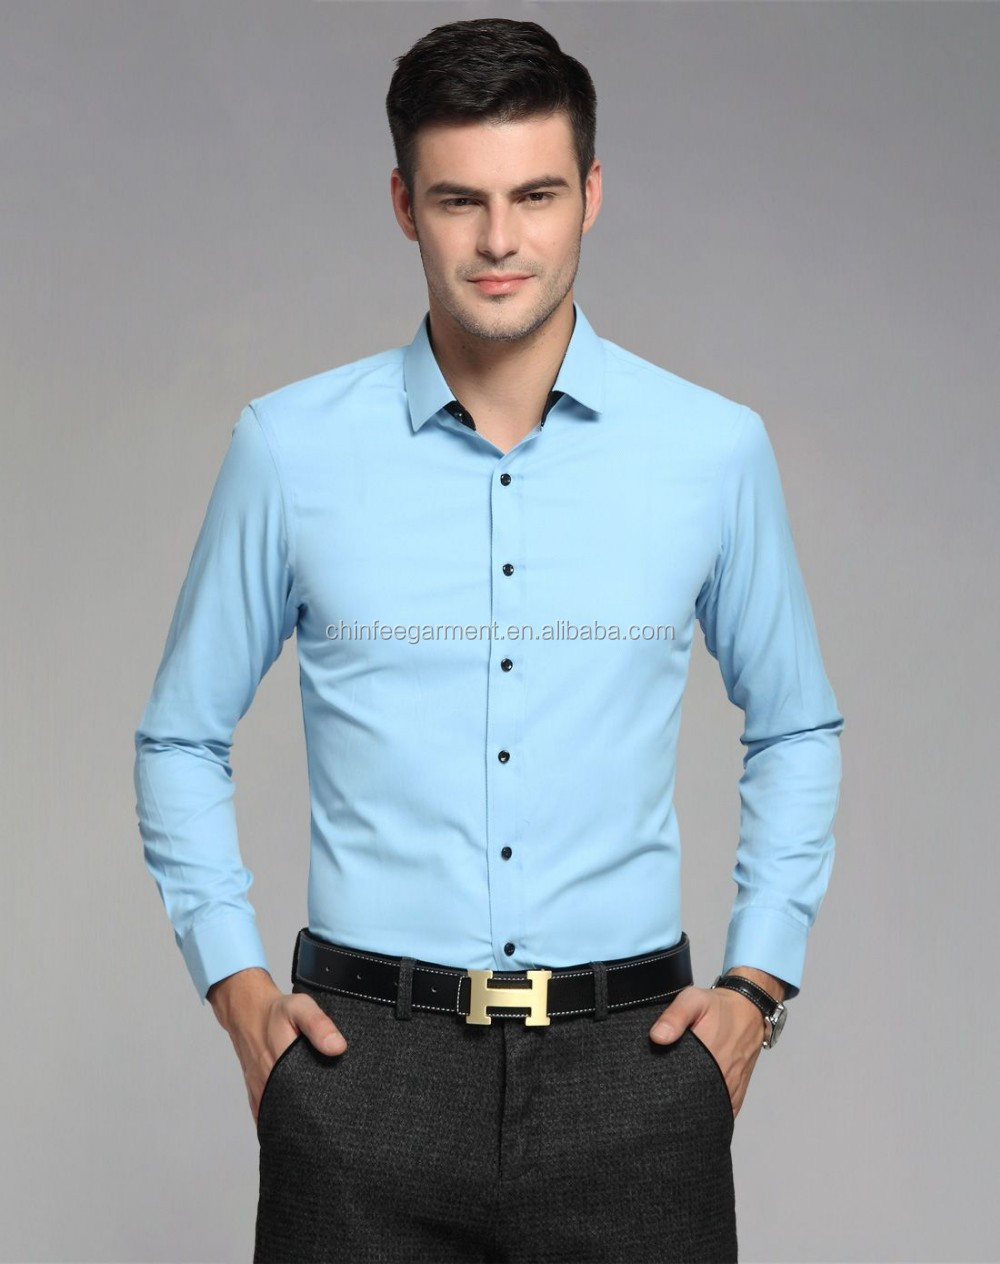 Latest Design Mens Formal Shirts Designs Man Dress Shirt - Buy ...